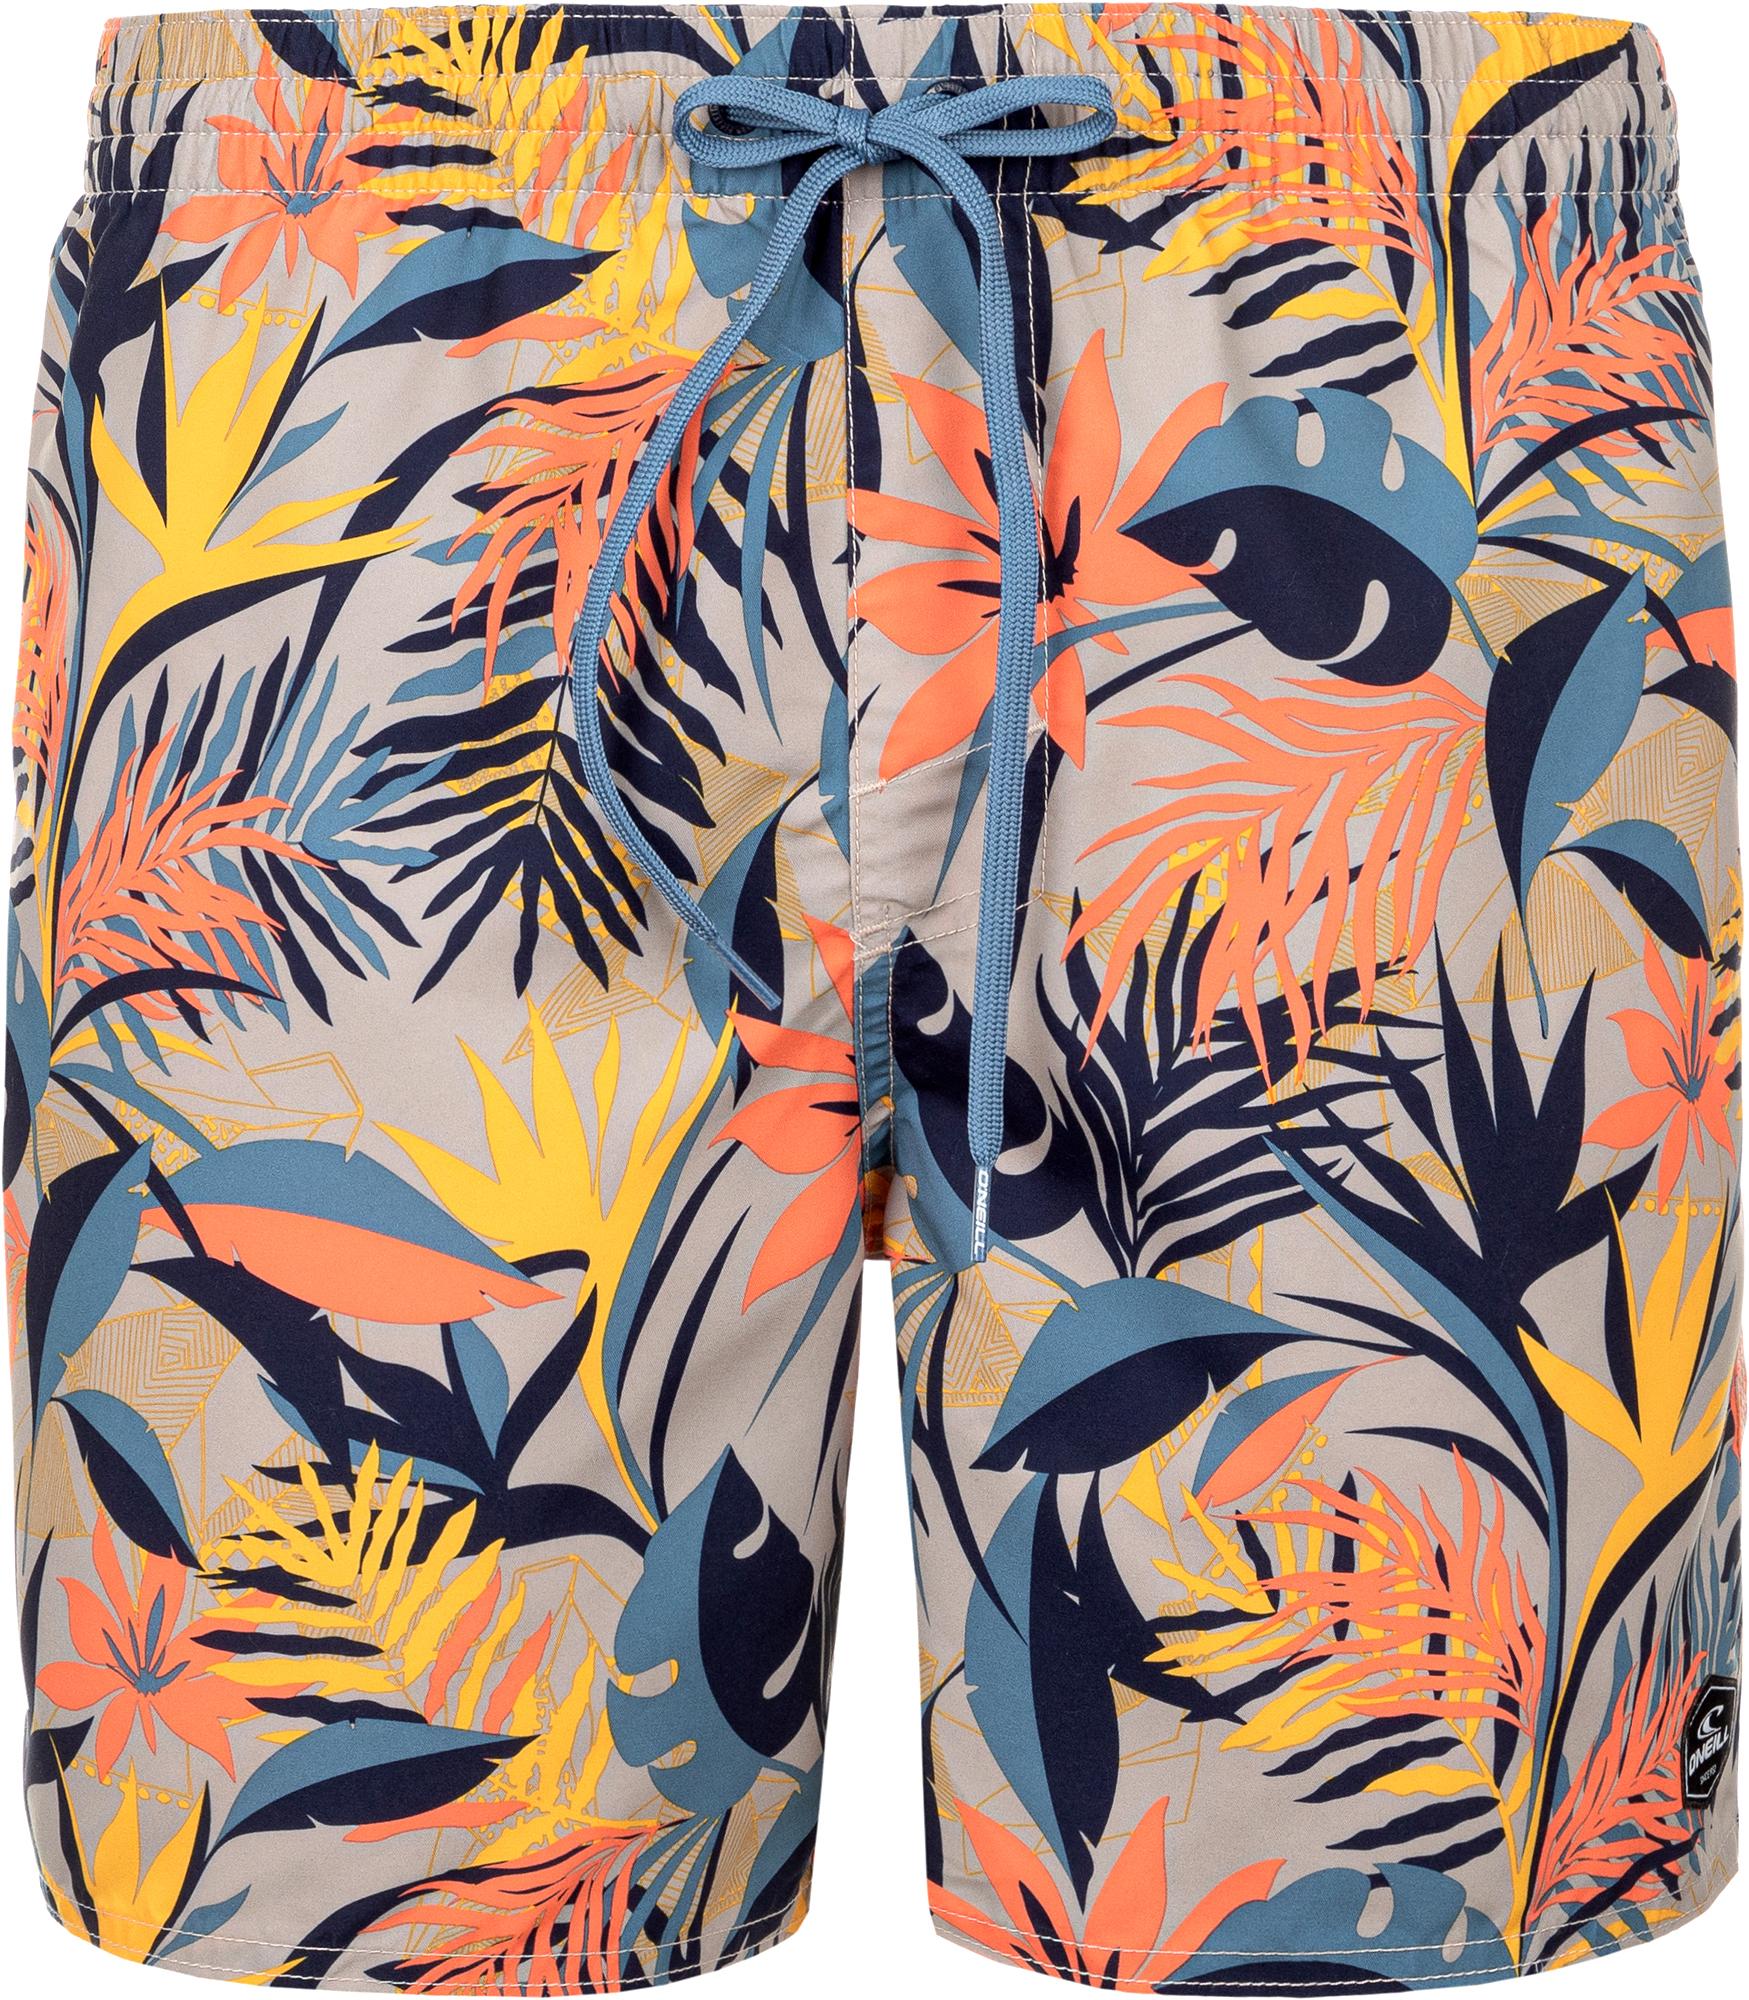 O'Neill Шорты пляжные мужские O'Neill Flower, размер 50-52 o neill шорты пляжные мужские o neill cali размер 54 56